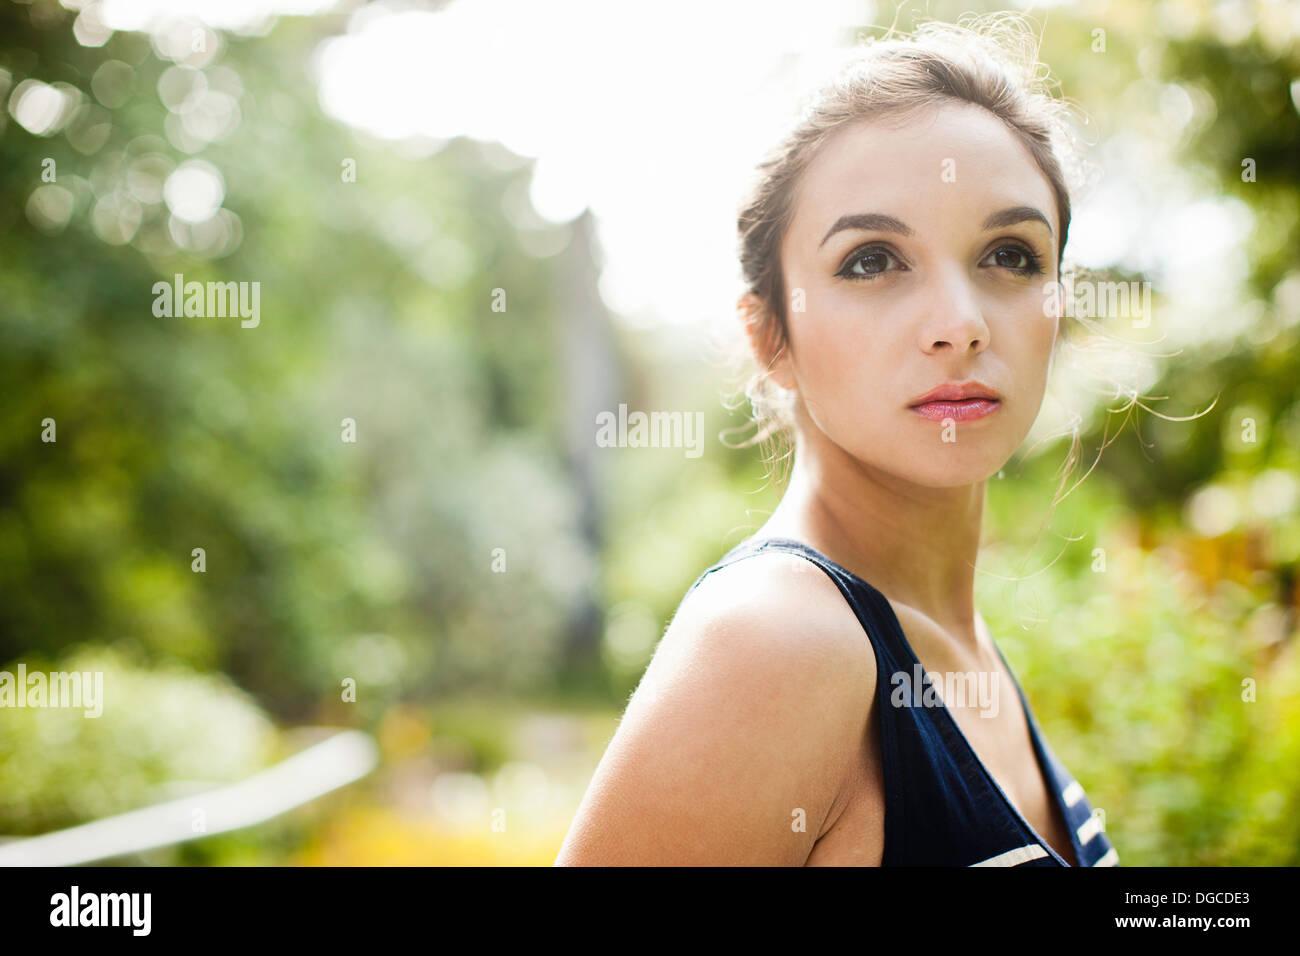 Mujer joven apartar la mirada, cerrar Imagen De Stock